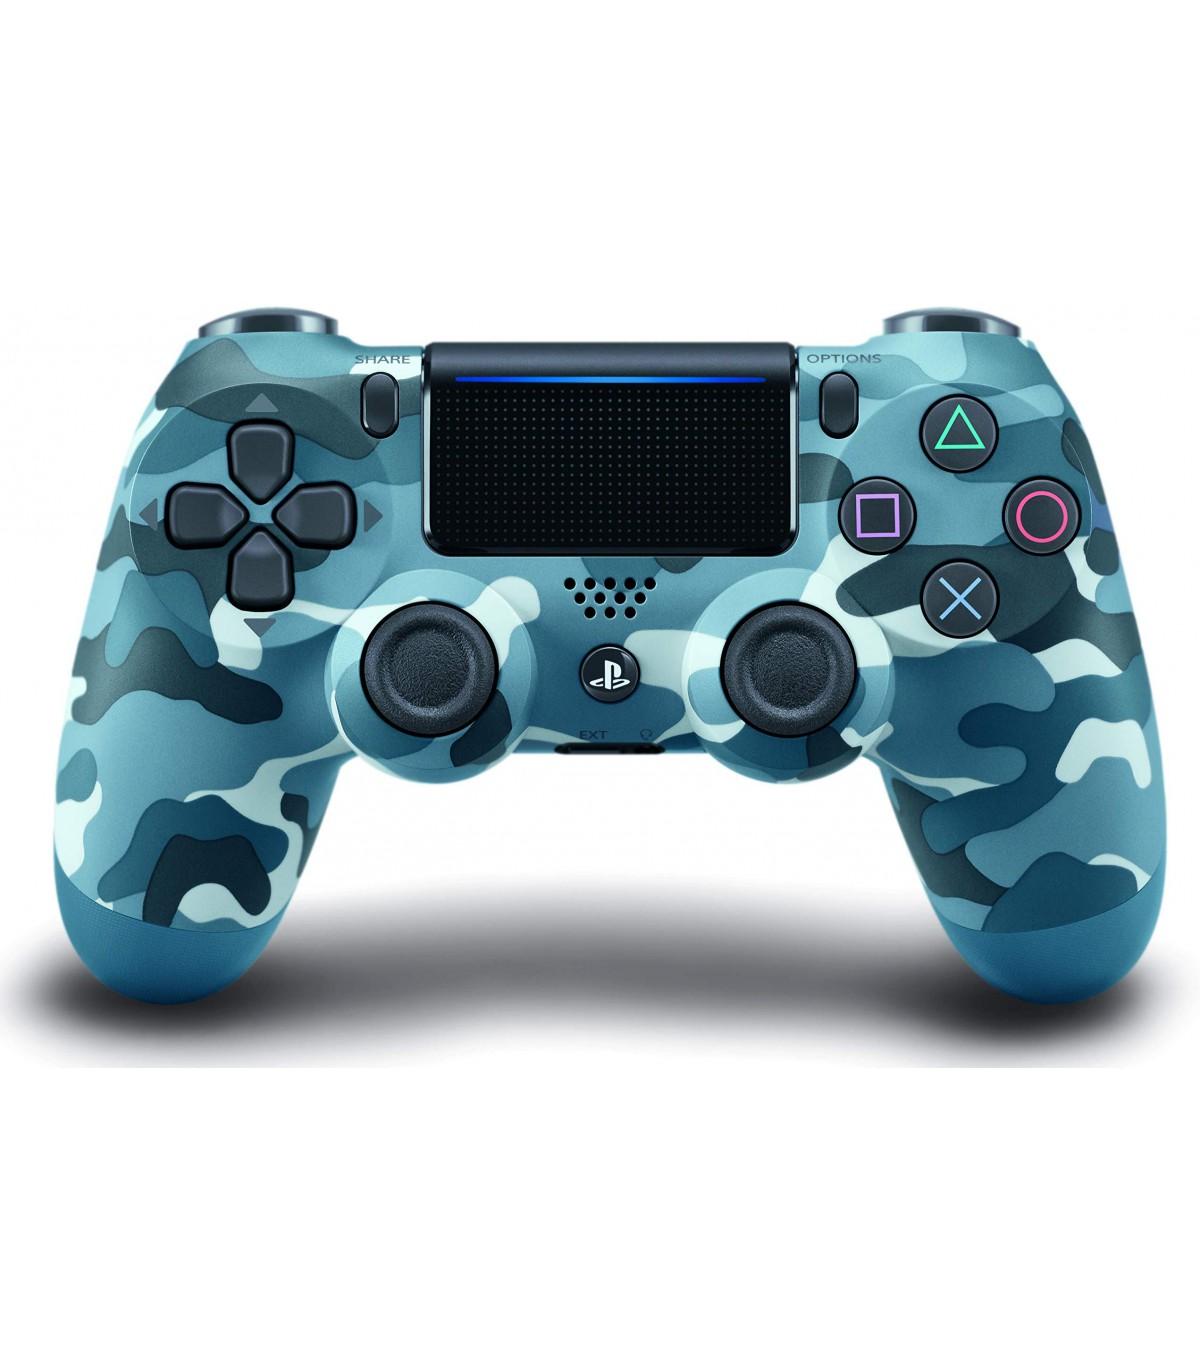 دسته DualShock 4 Wireless Controller ارتشی آبی - پلی استیشن 4